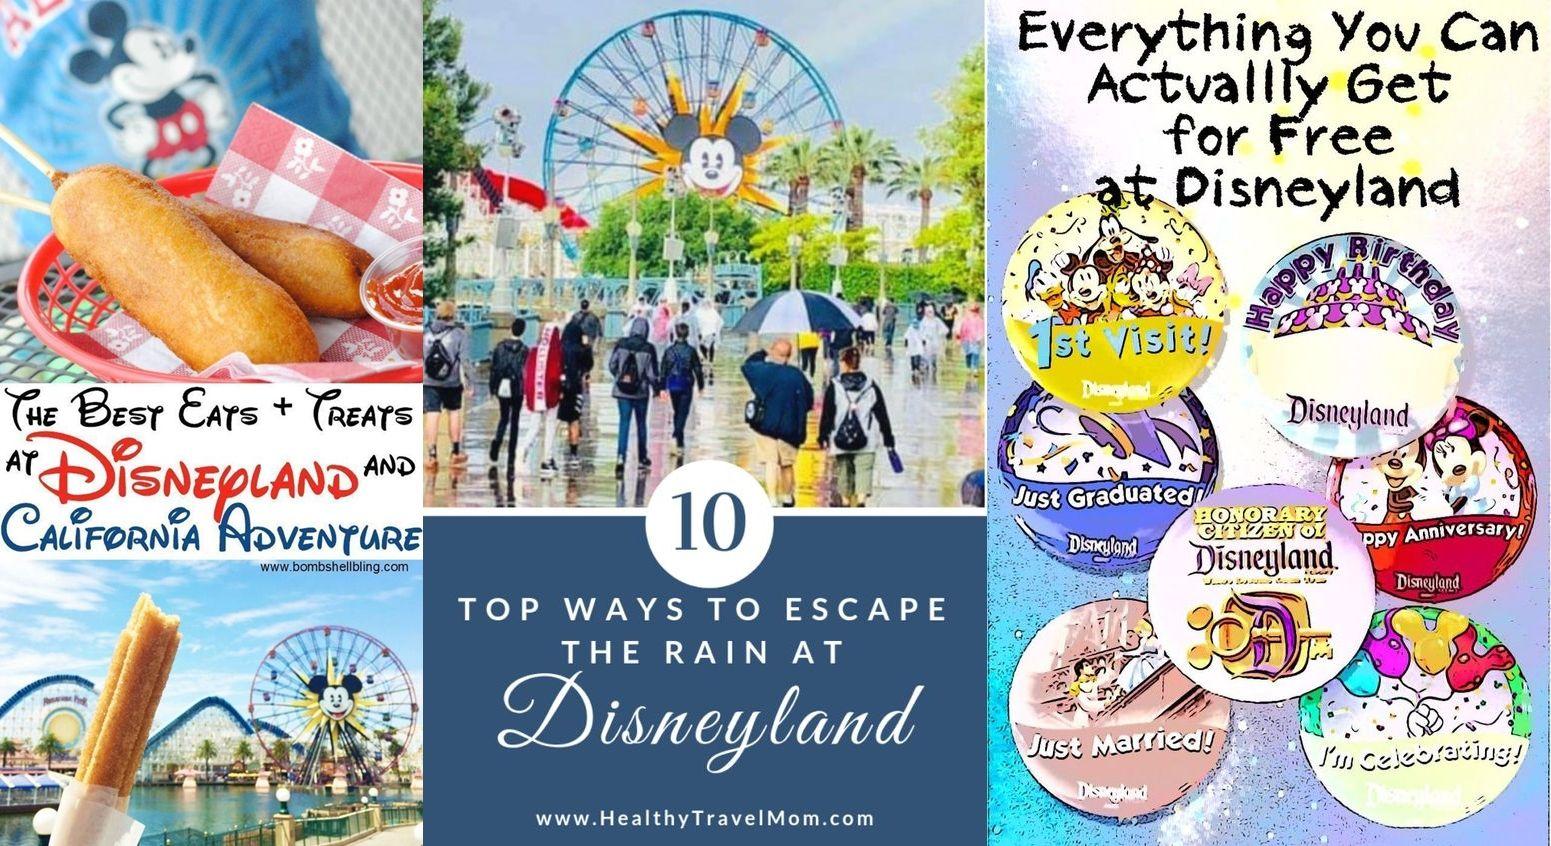 Pin on Discount Disney world